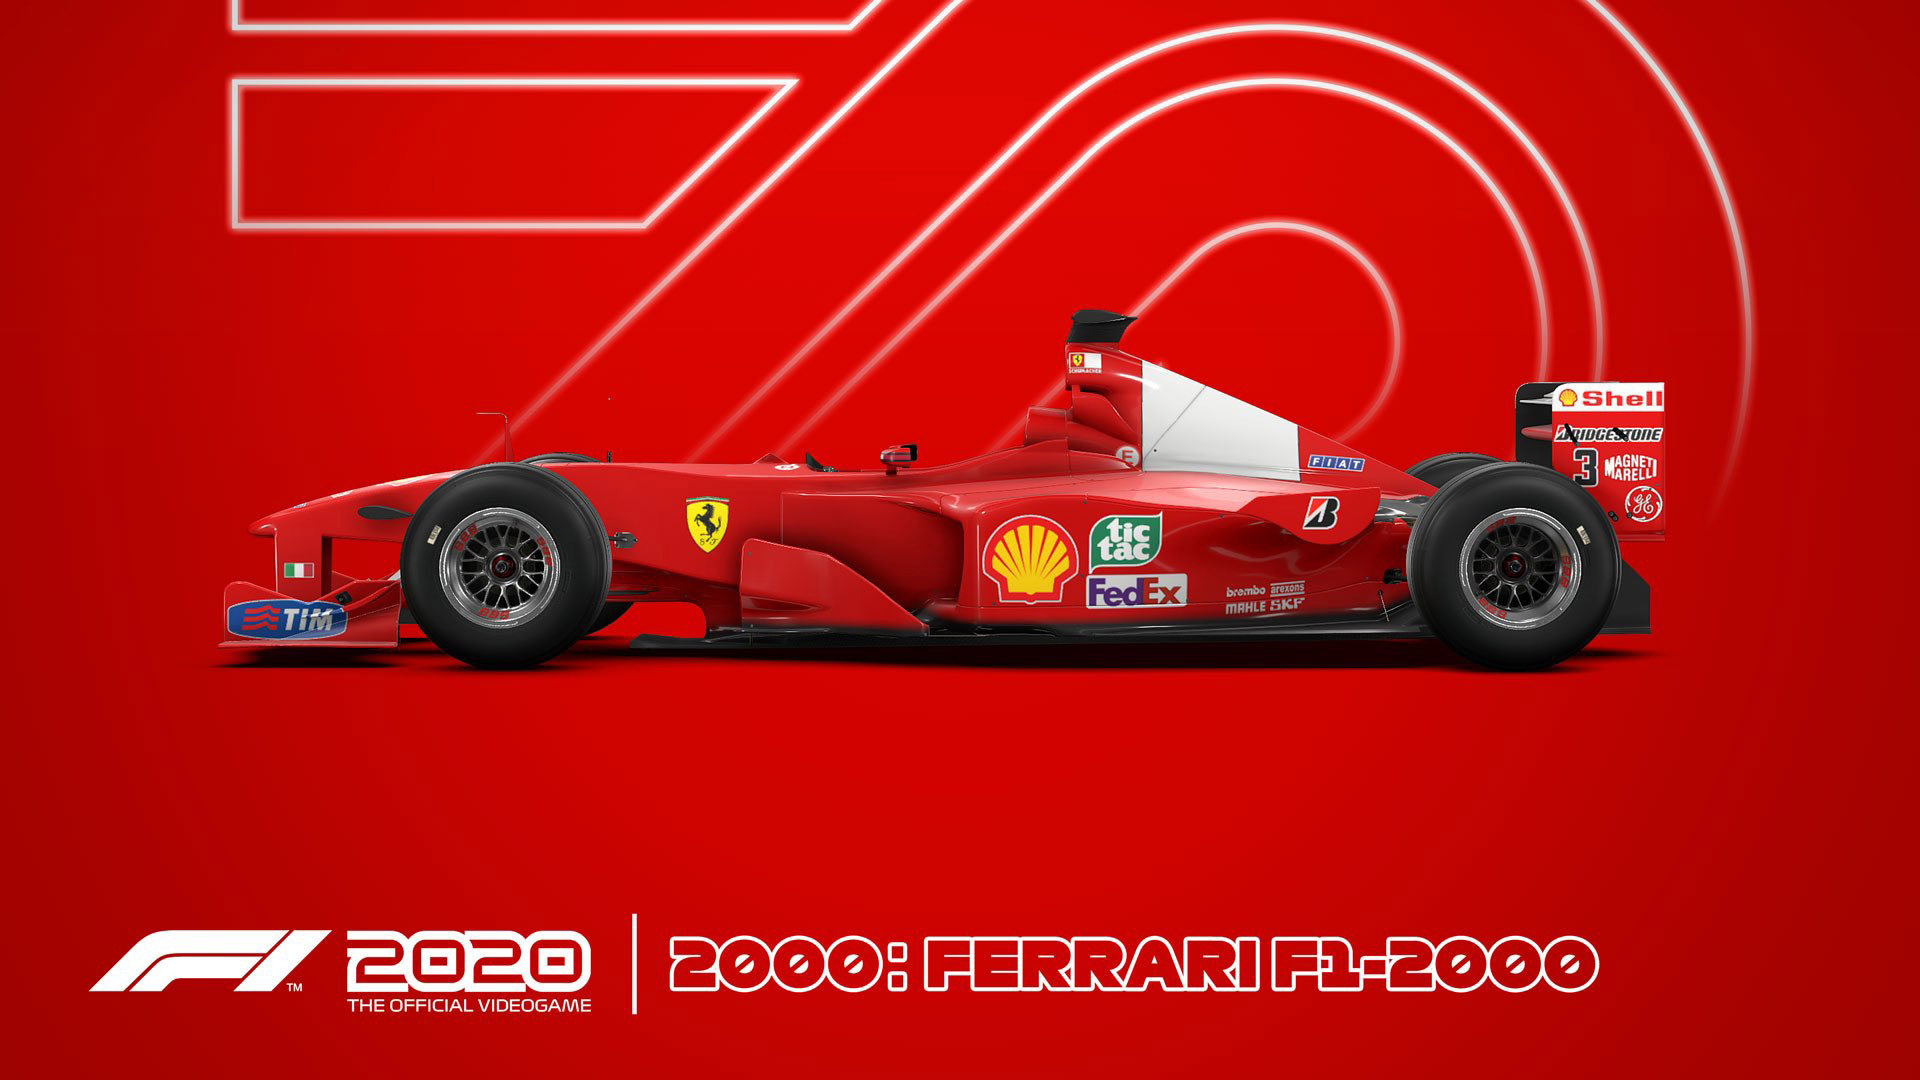 F1 2020 Wallpaper in 1920x1080